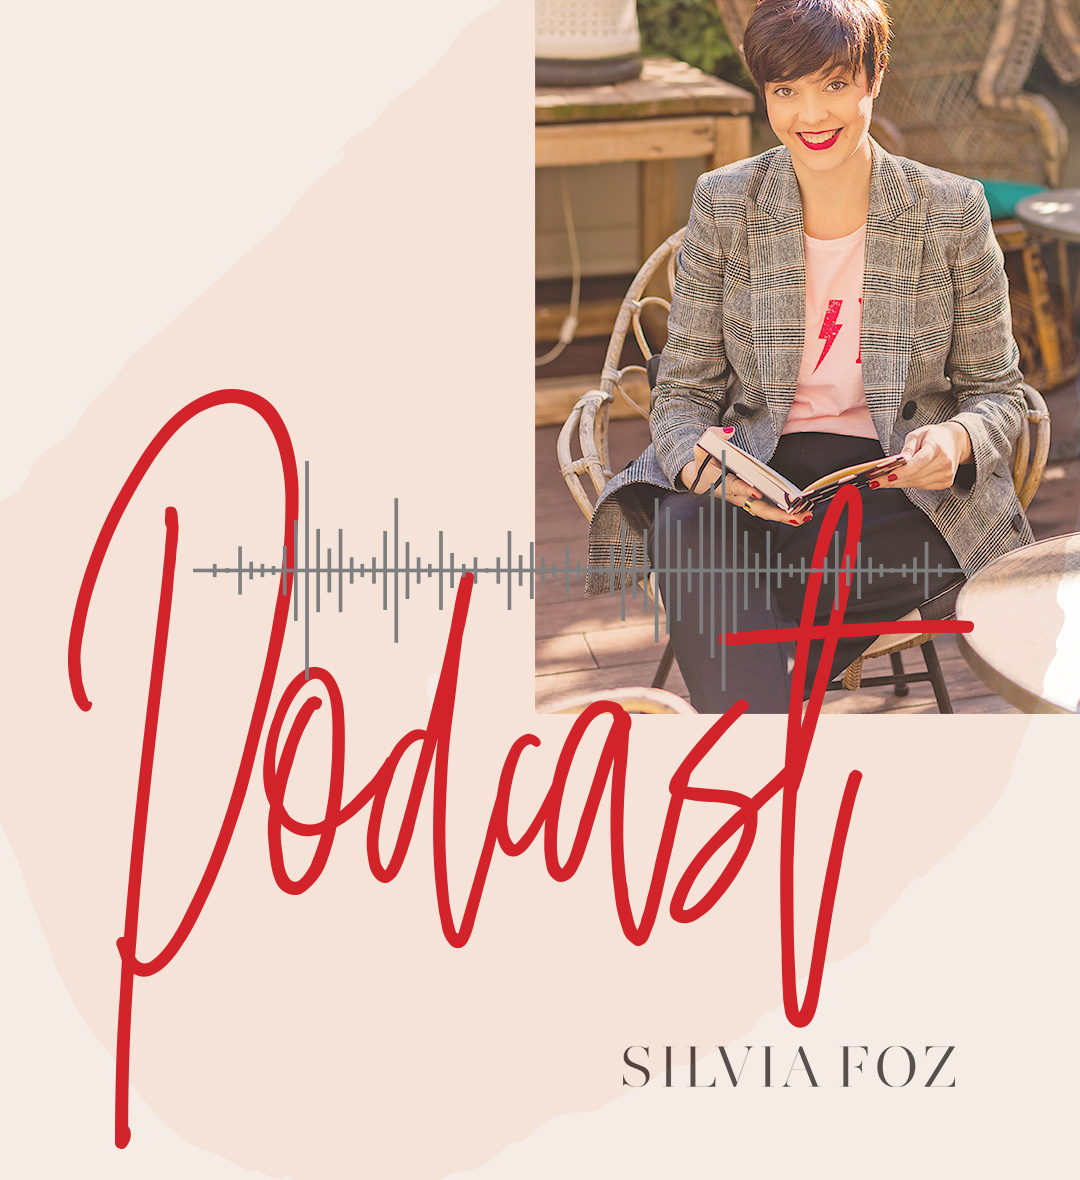 Silvia Foz podcast de estilo